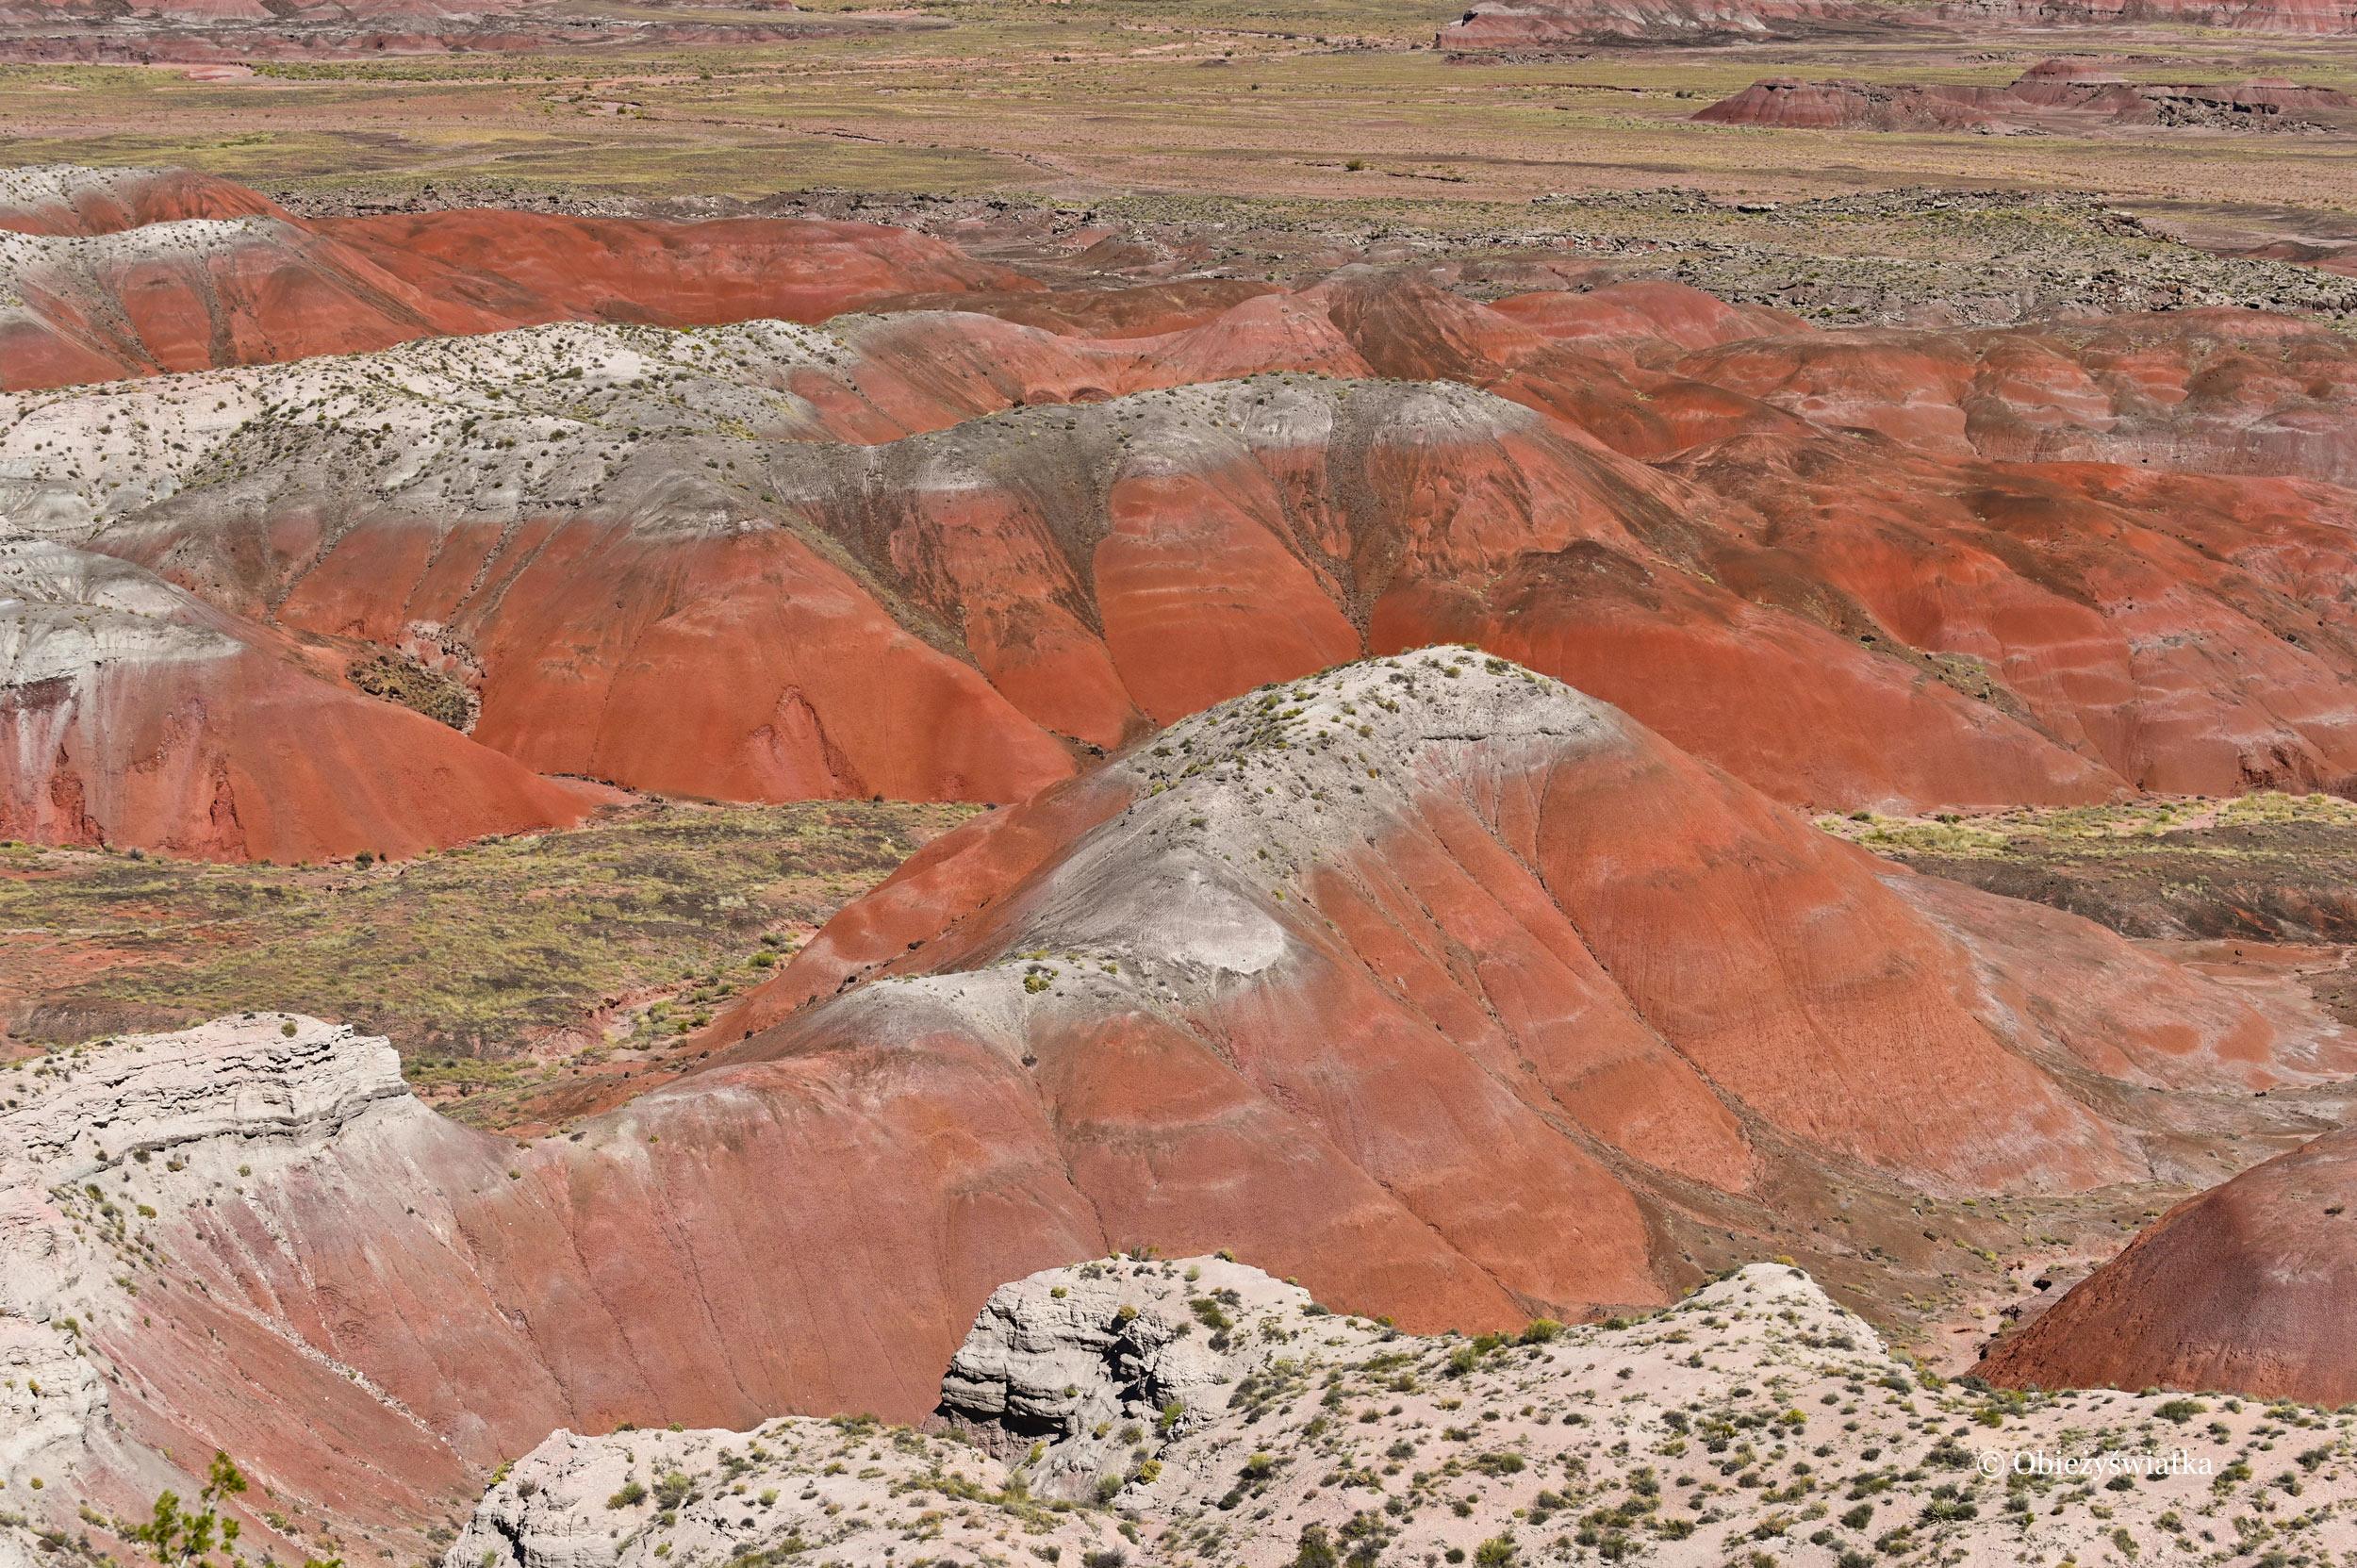 Pustynia Pstra - Painted Desert, Arizona